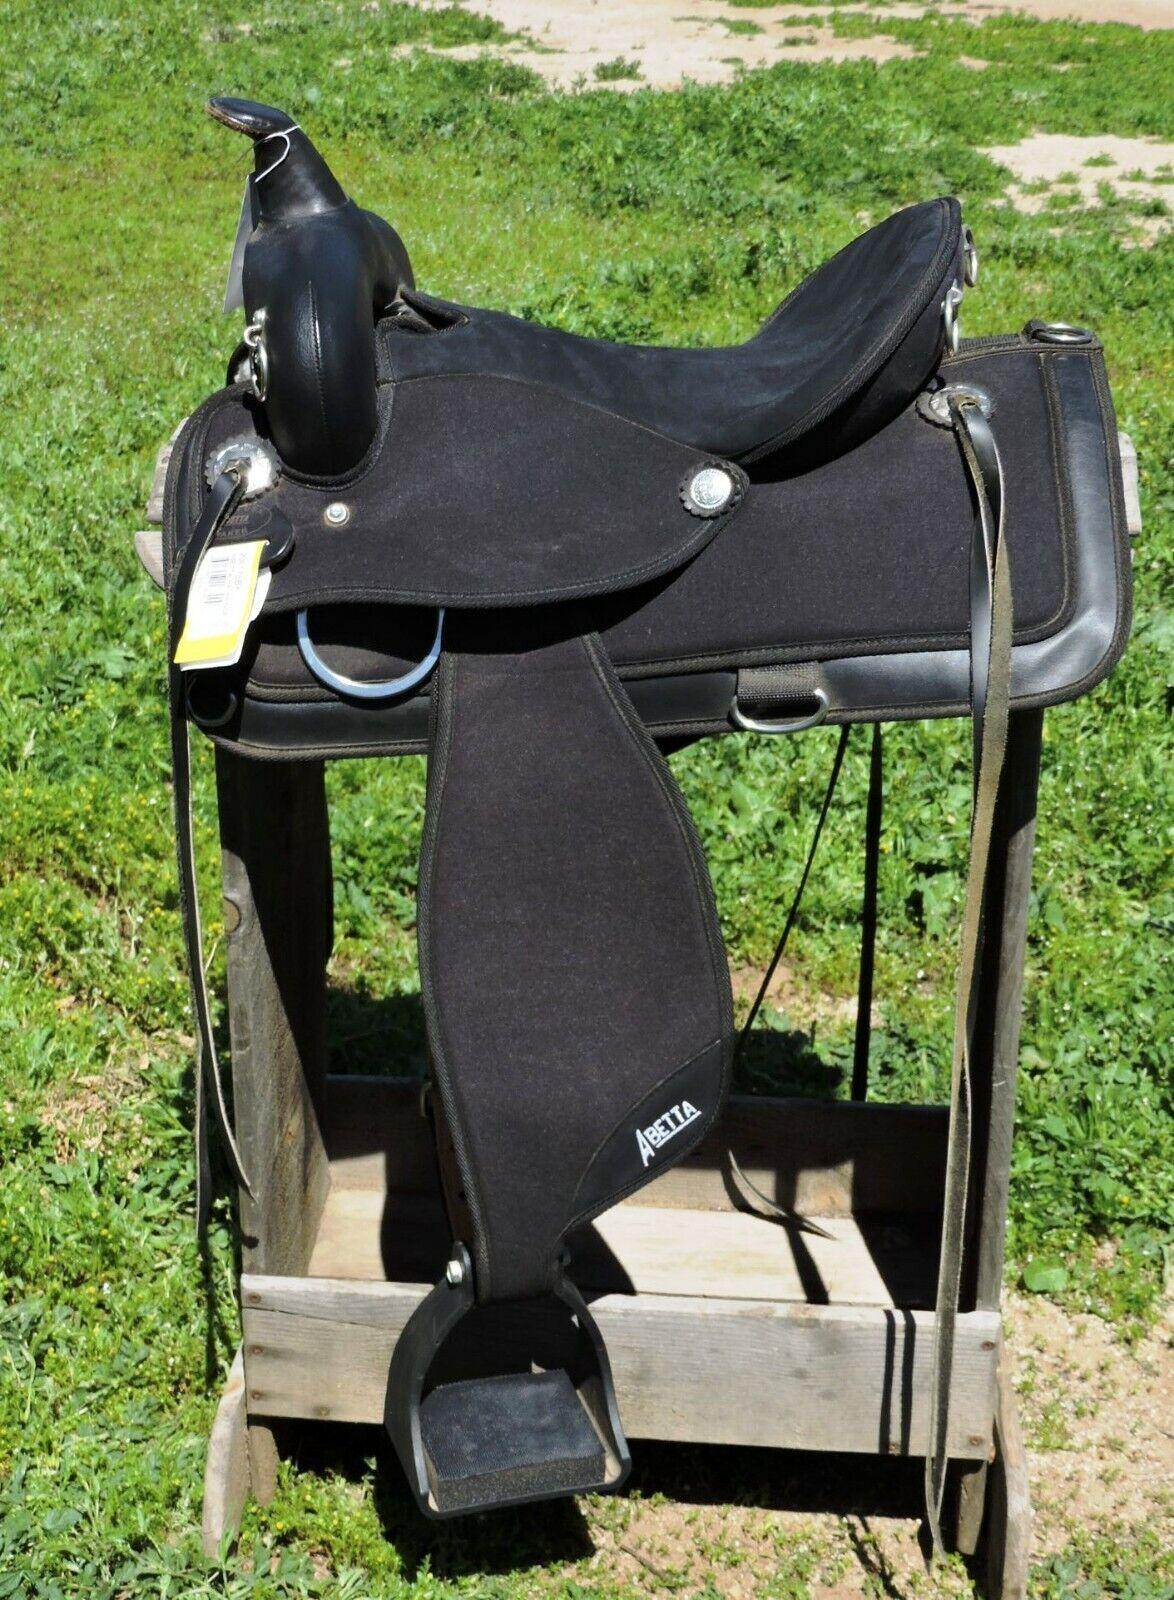 Abetta 15 Pathfinder Cordura Nylon Western Trail Saddle